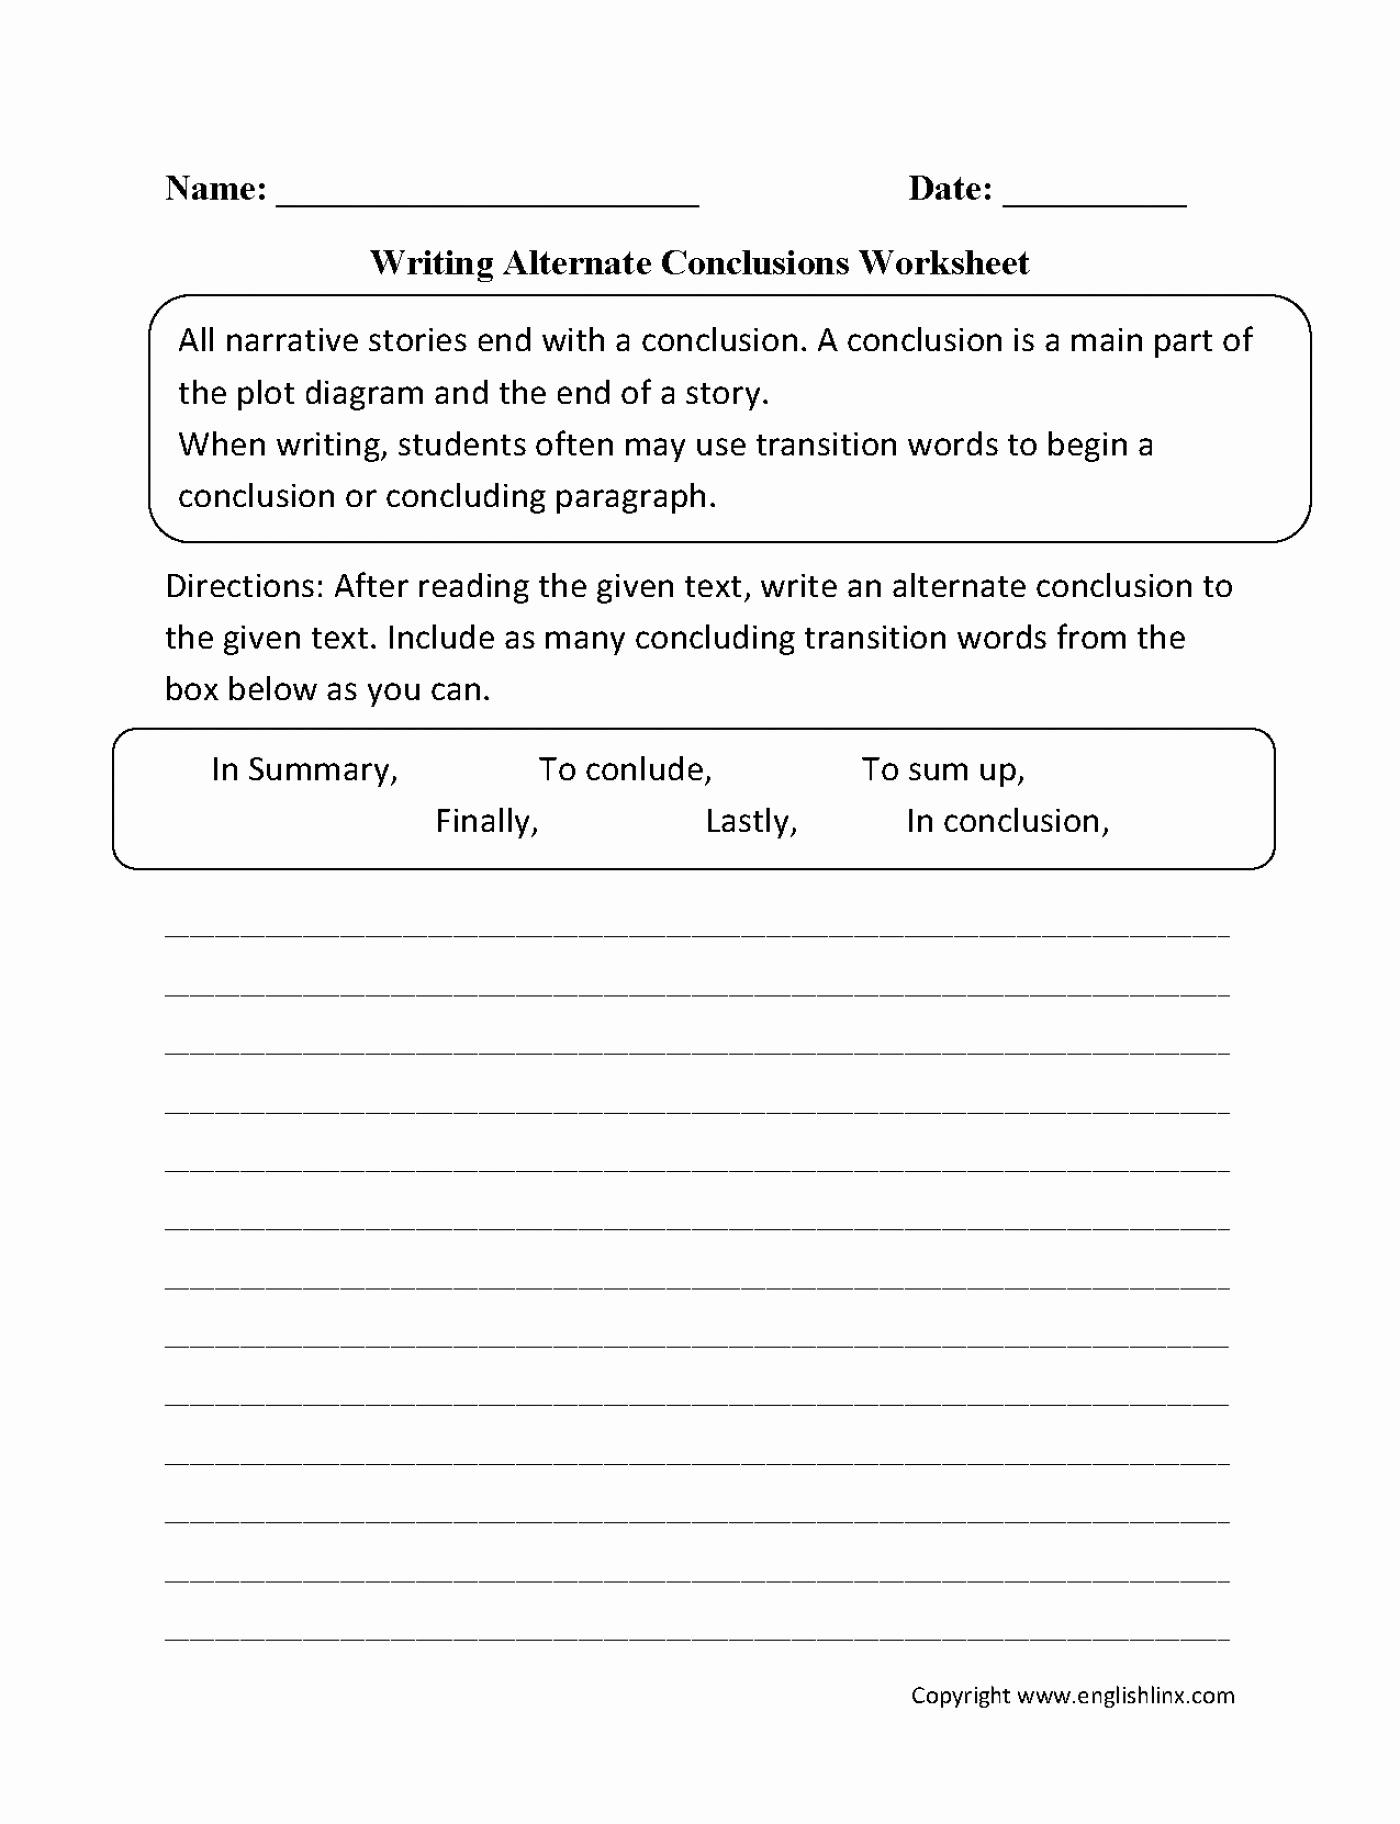 Free Paragraph Writing Worksheets Beautiful 5th Grade Paragraph Writing Worksheets